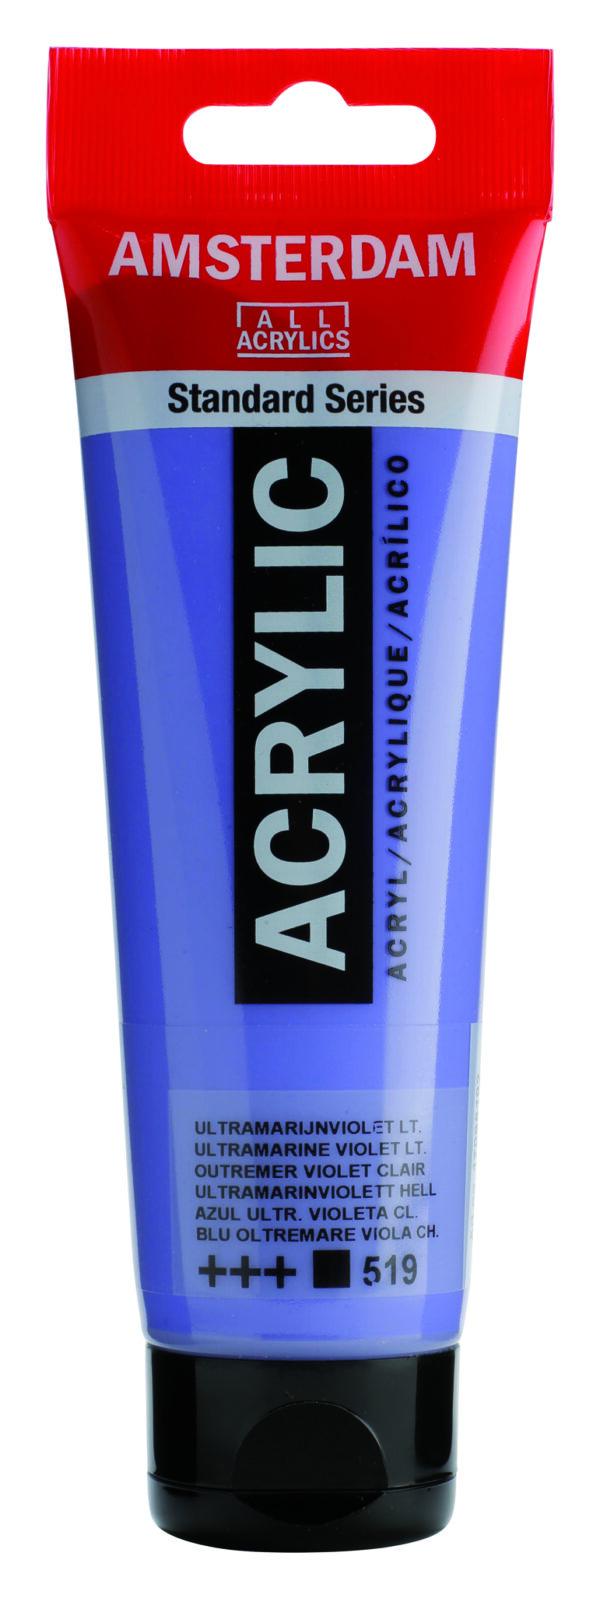 Ams std 519 Ultramarine violet Light - 120 ml